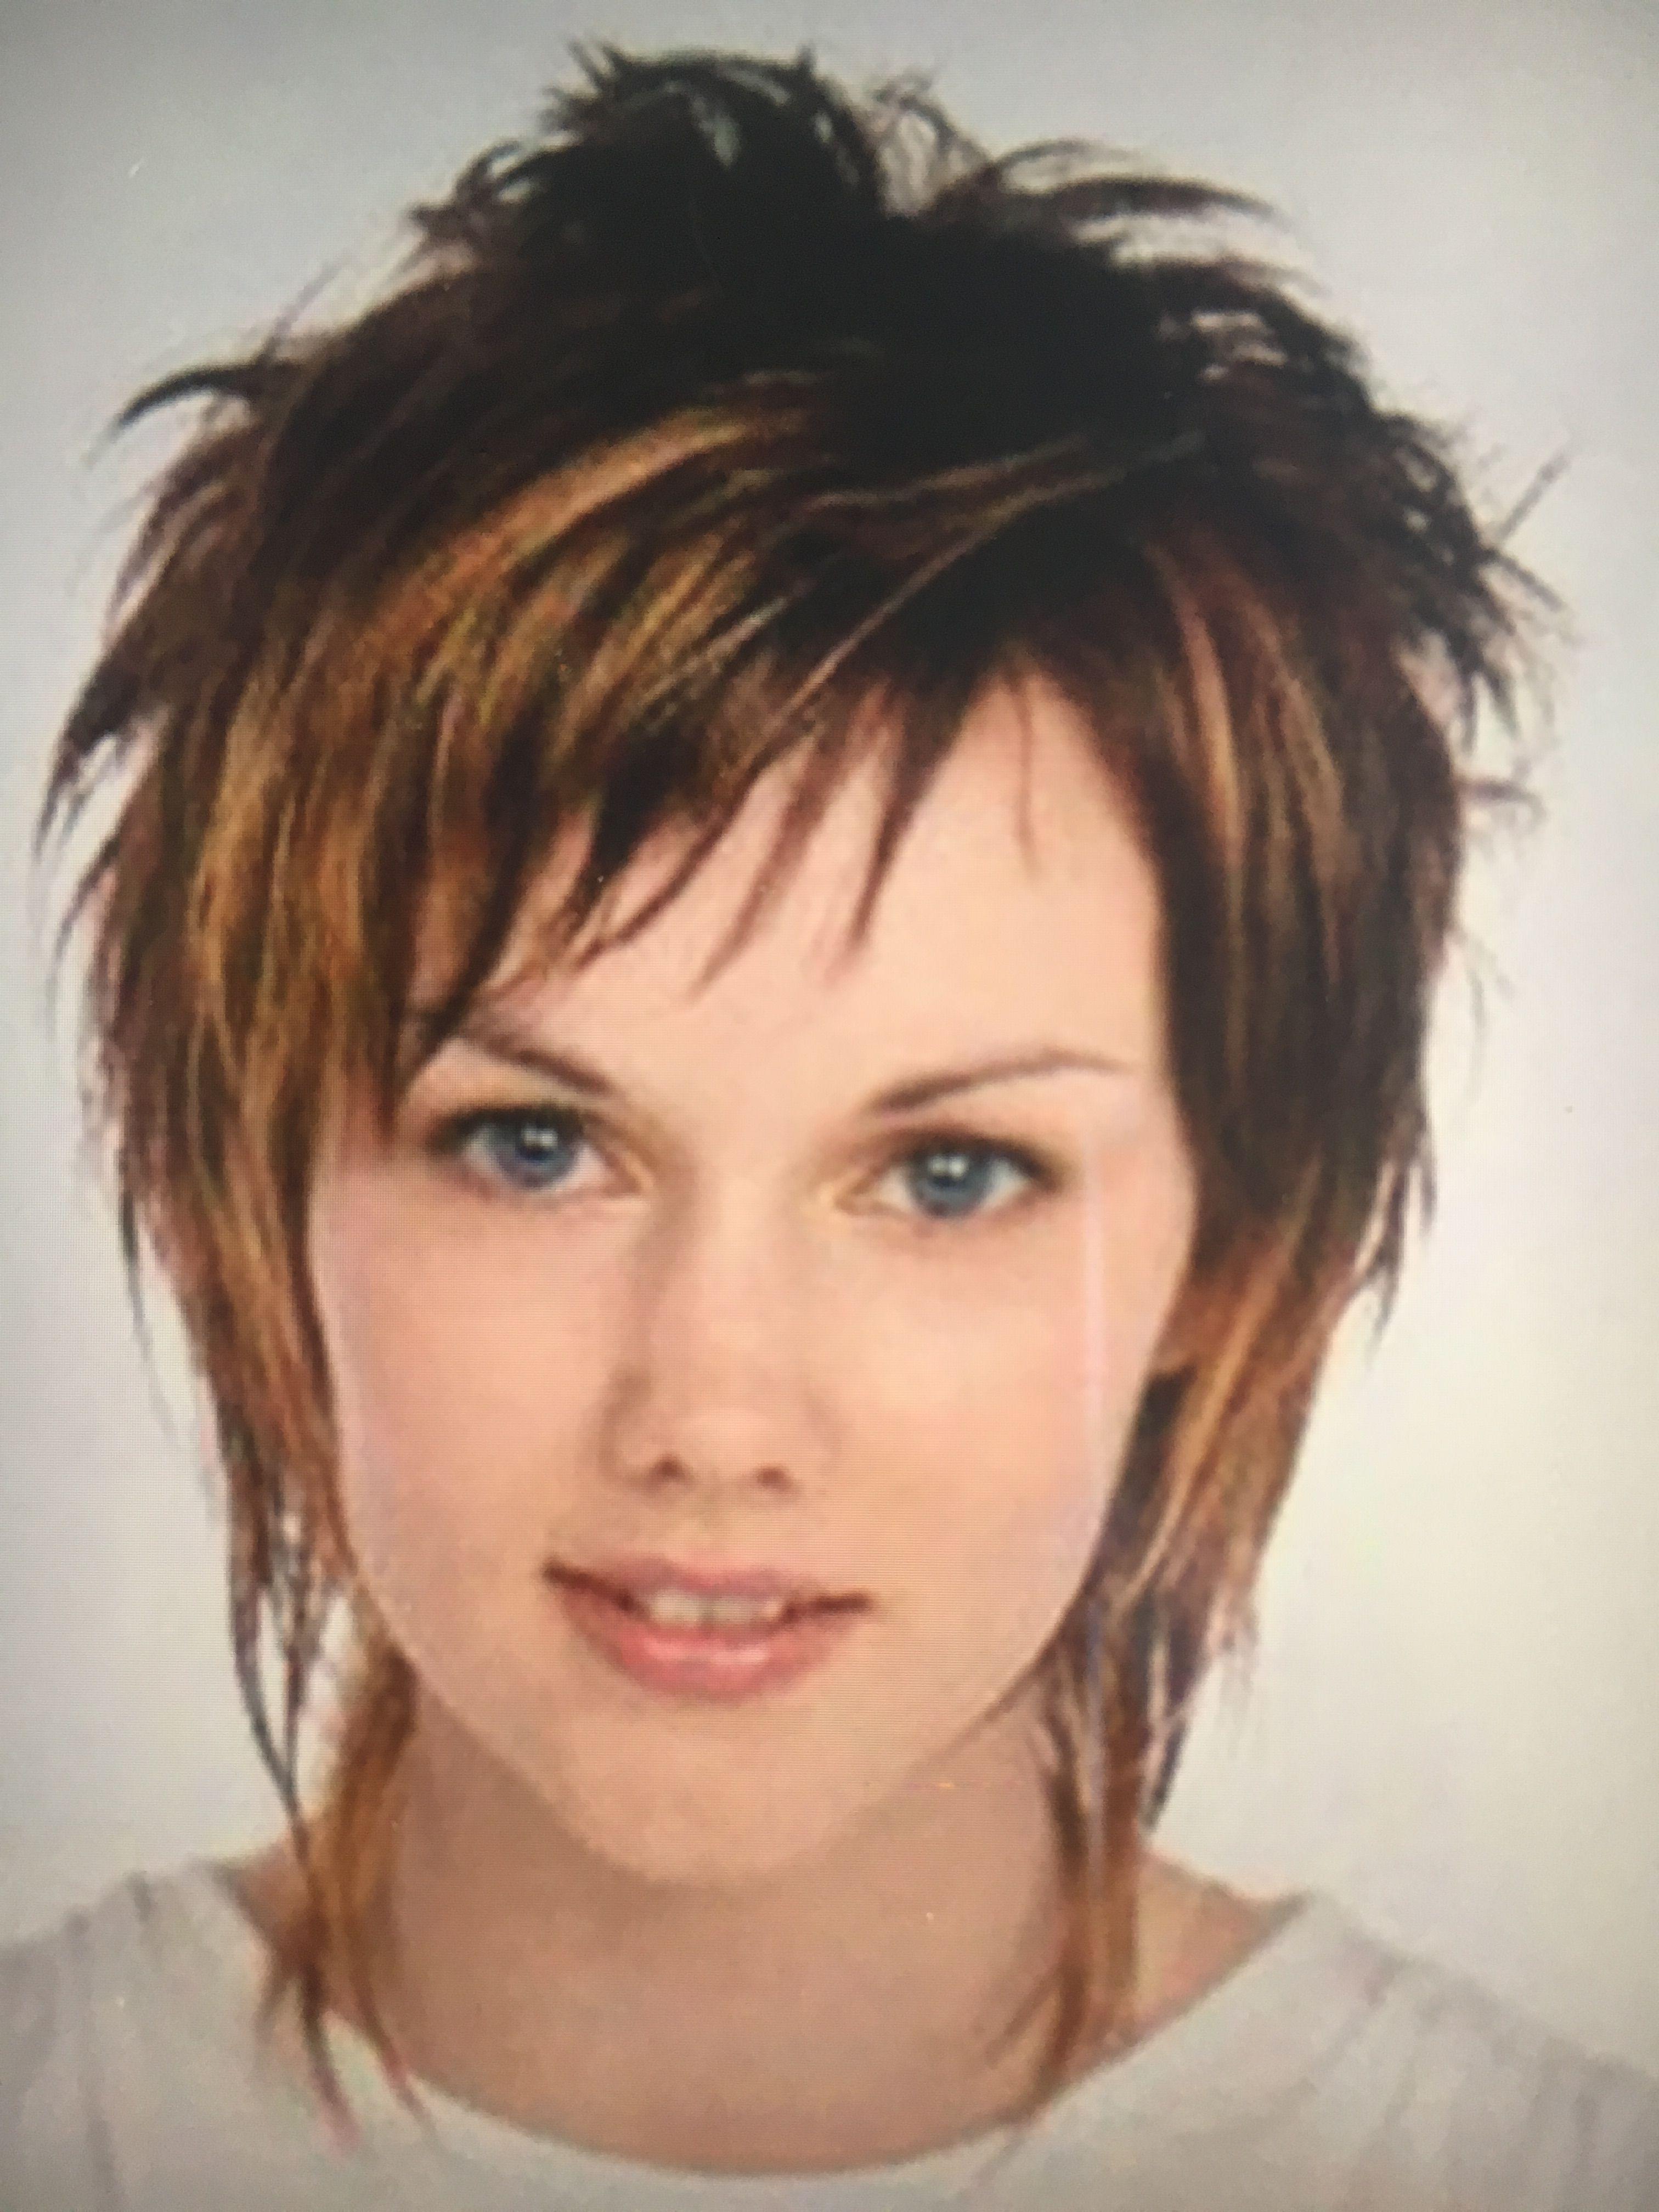 Funky Frisuren Funky Frisuren Manner Schnitte Manner Frisur Manner Unterschnittenen Lose Locken In 2020 Short Hair Haircuts Edgy Hair Rocker Hair